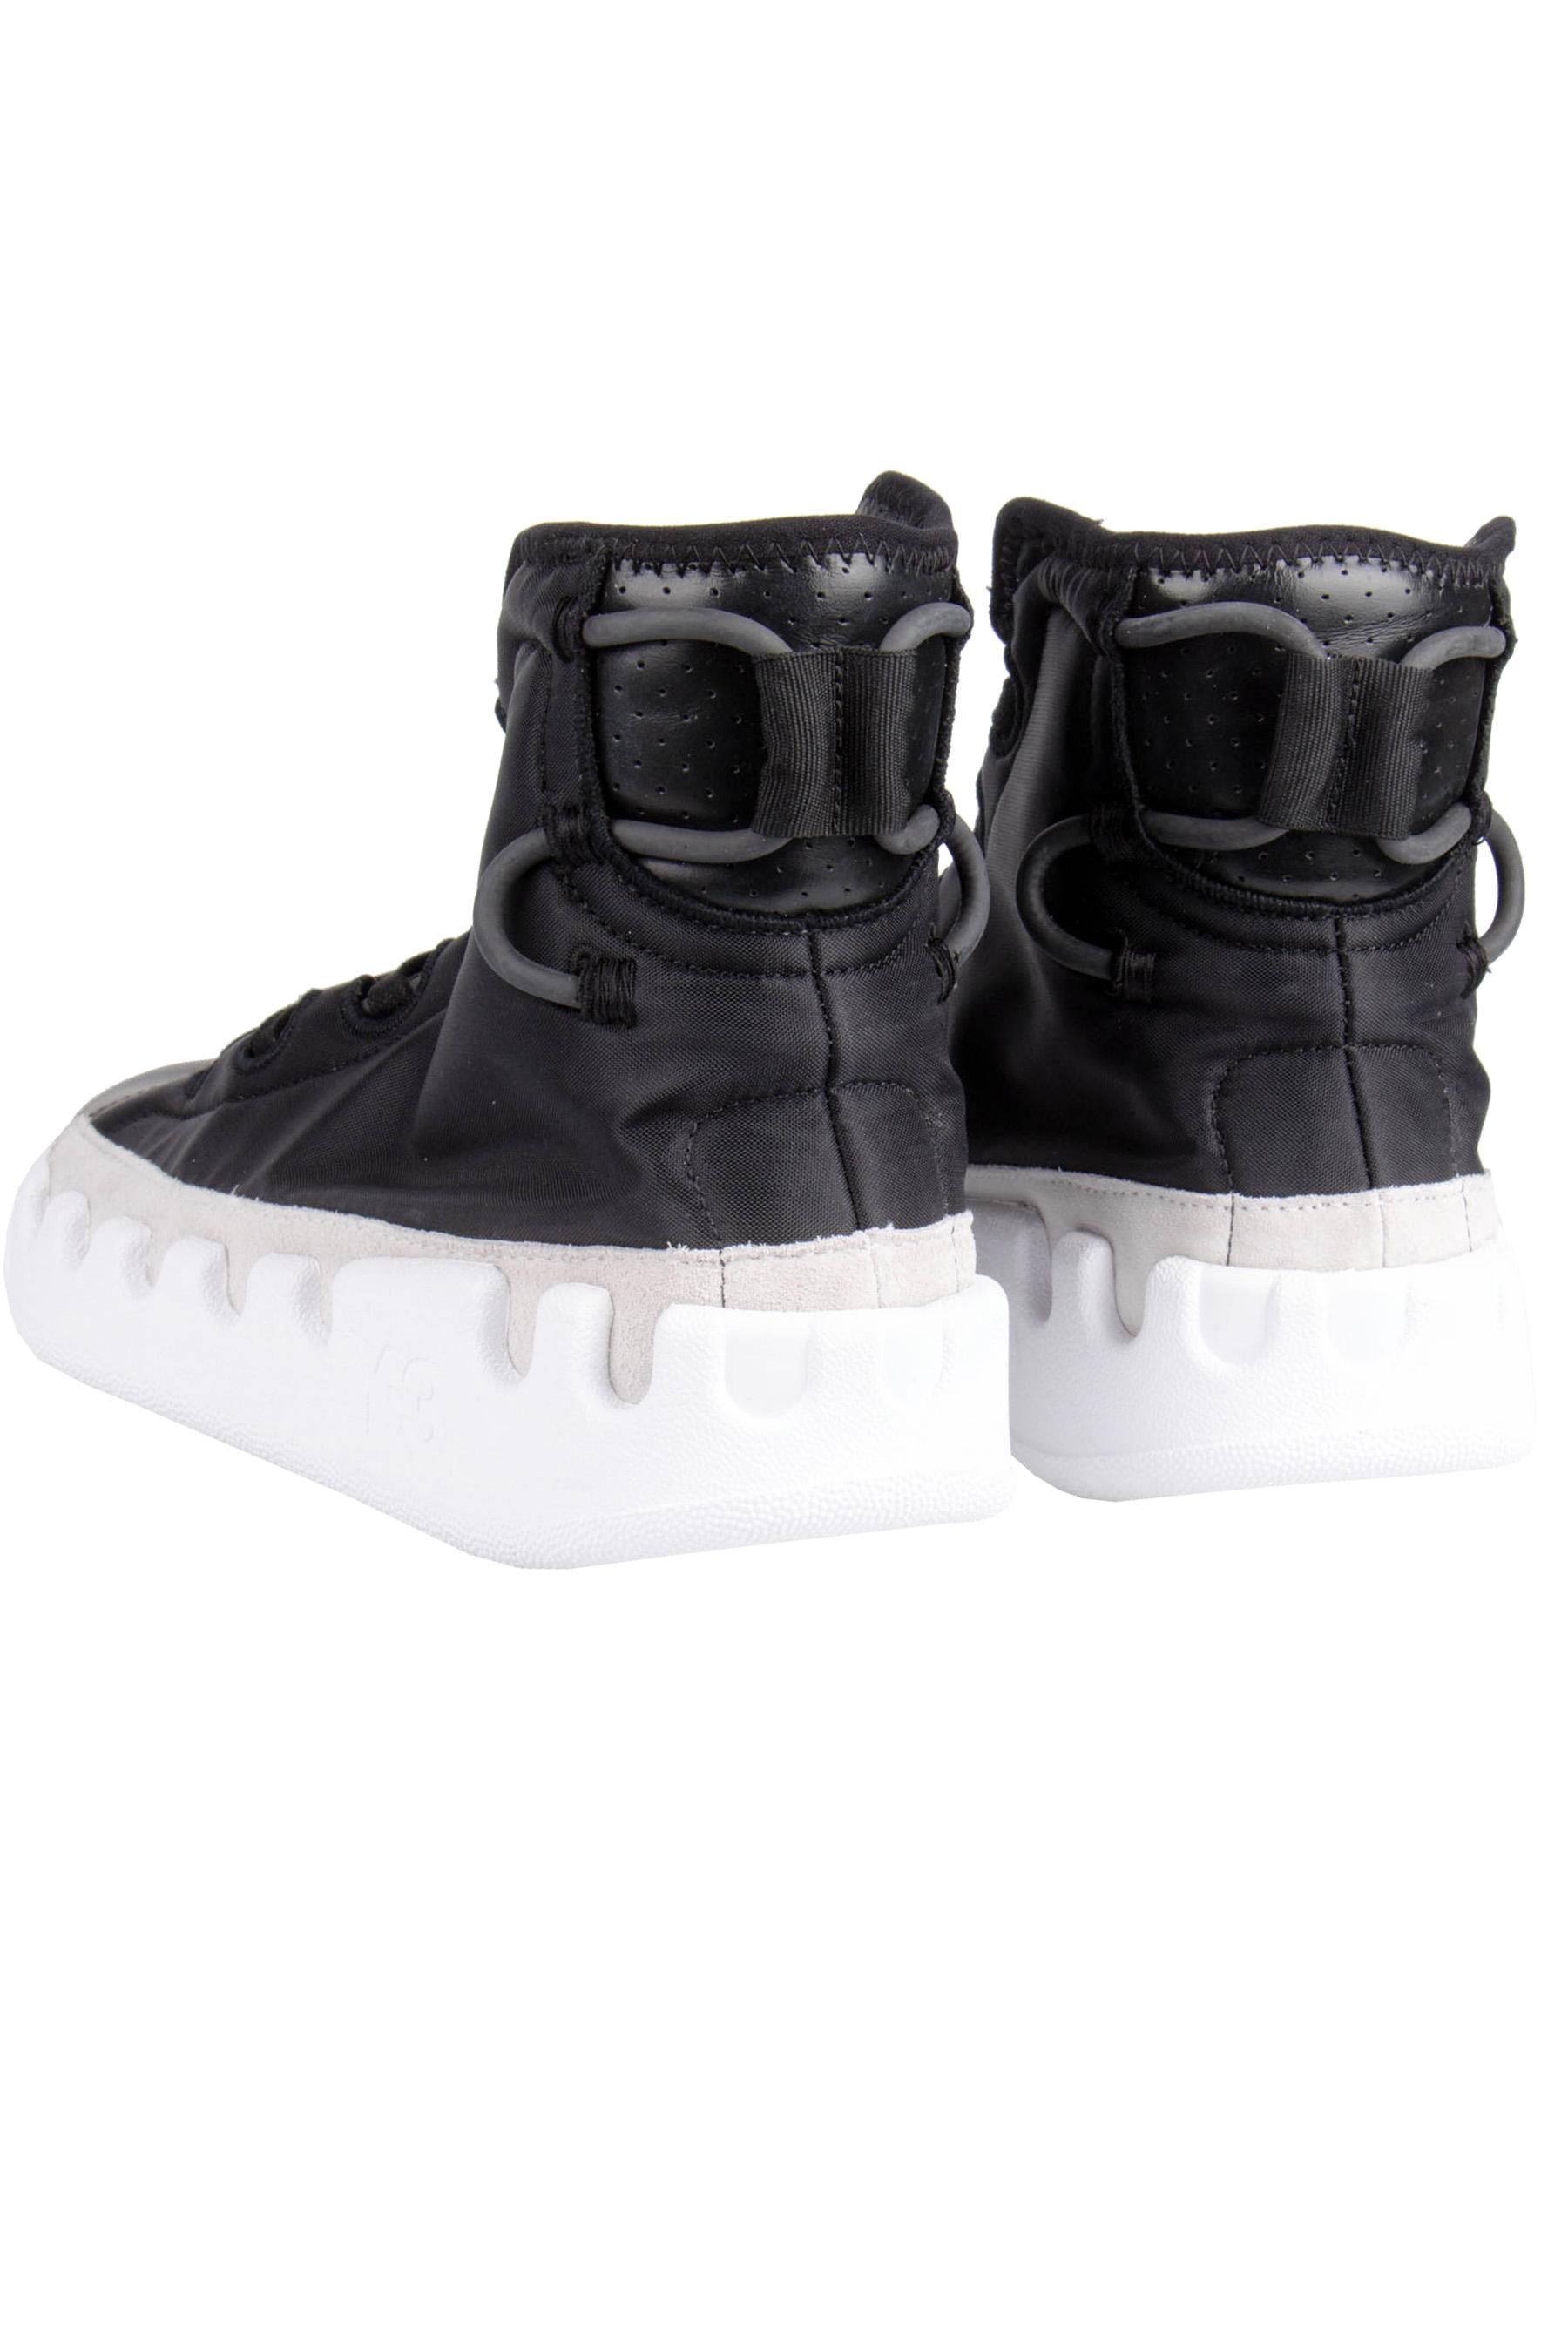 dddfd5454b61a Preview  Y-3 Sneakers Kasabaru .